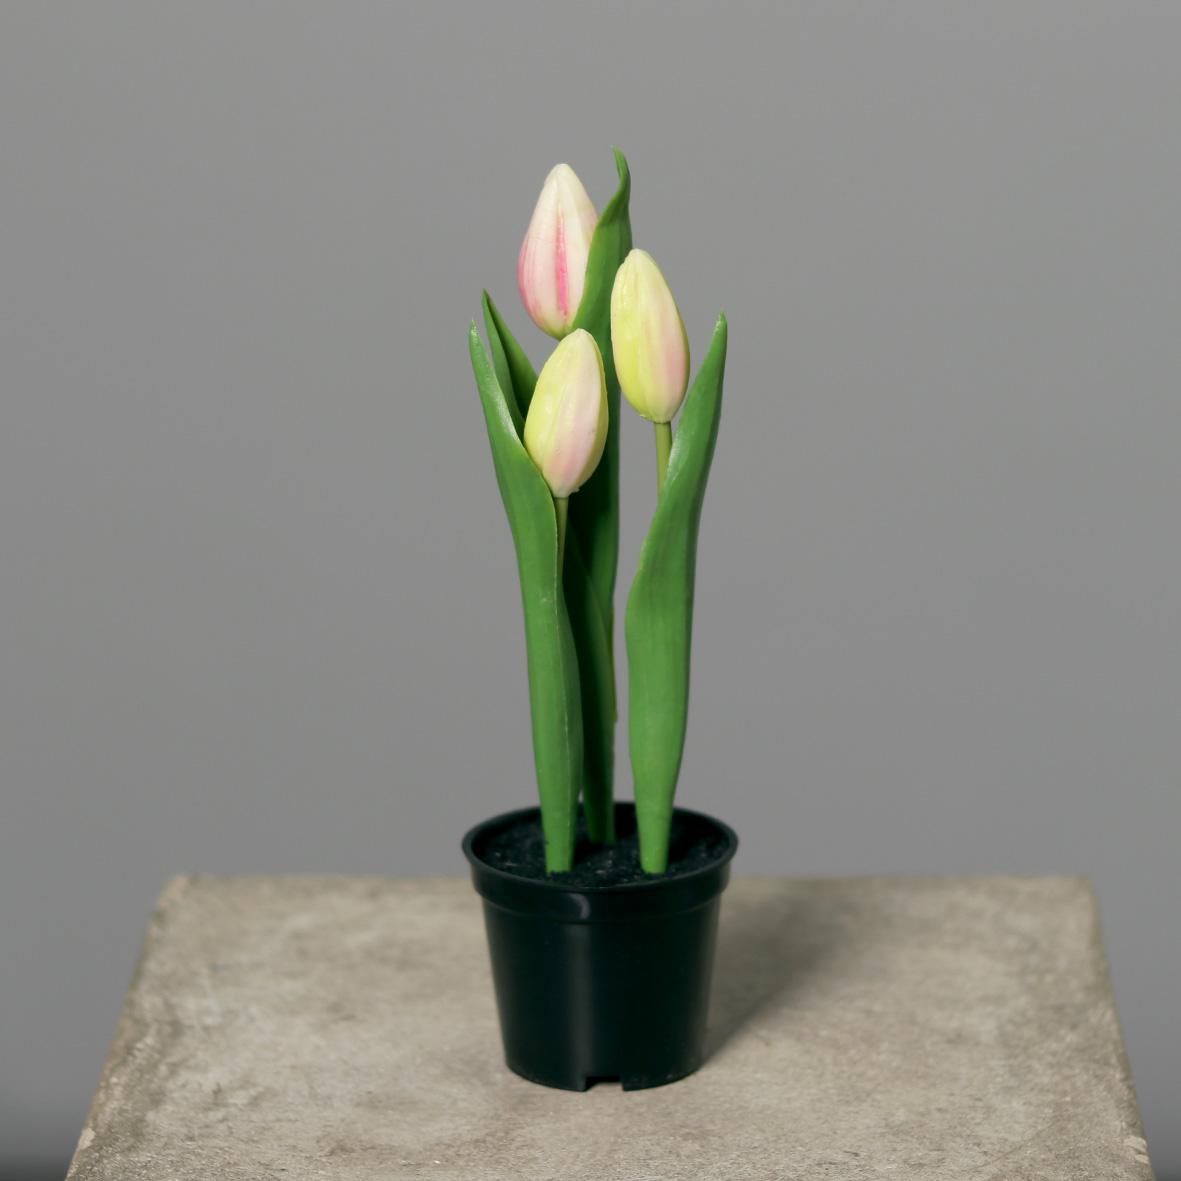 tulpen real touch 20cm rosa im topf dp kunstpflanzen k nstliche pflanzen tulpentopf fr hling. Black Bedroom Furniture Sets. Home Design Ideas